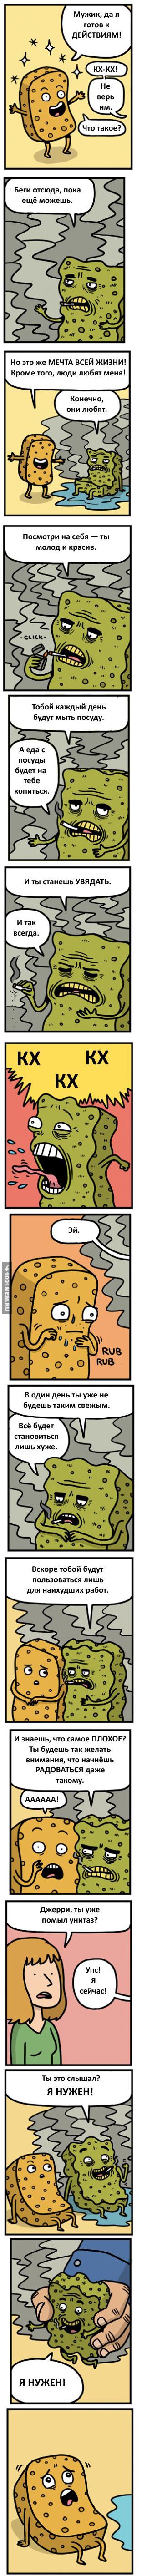 Жизнь губки